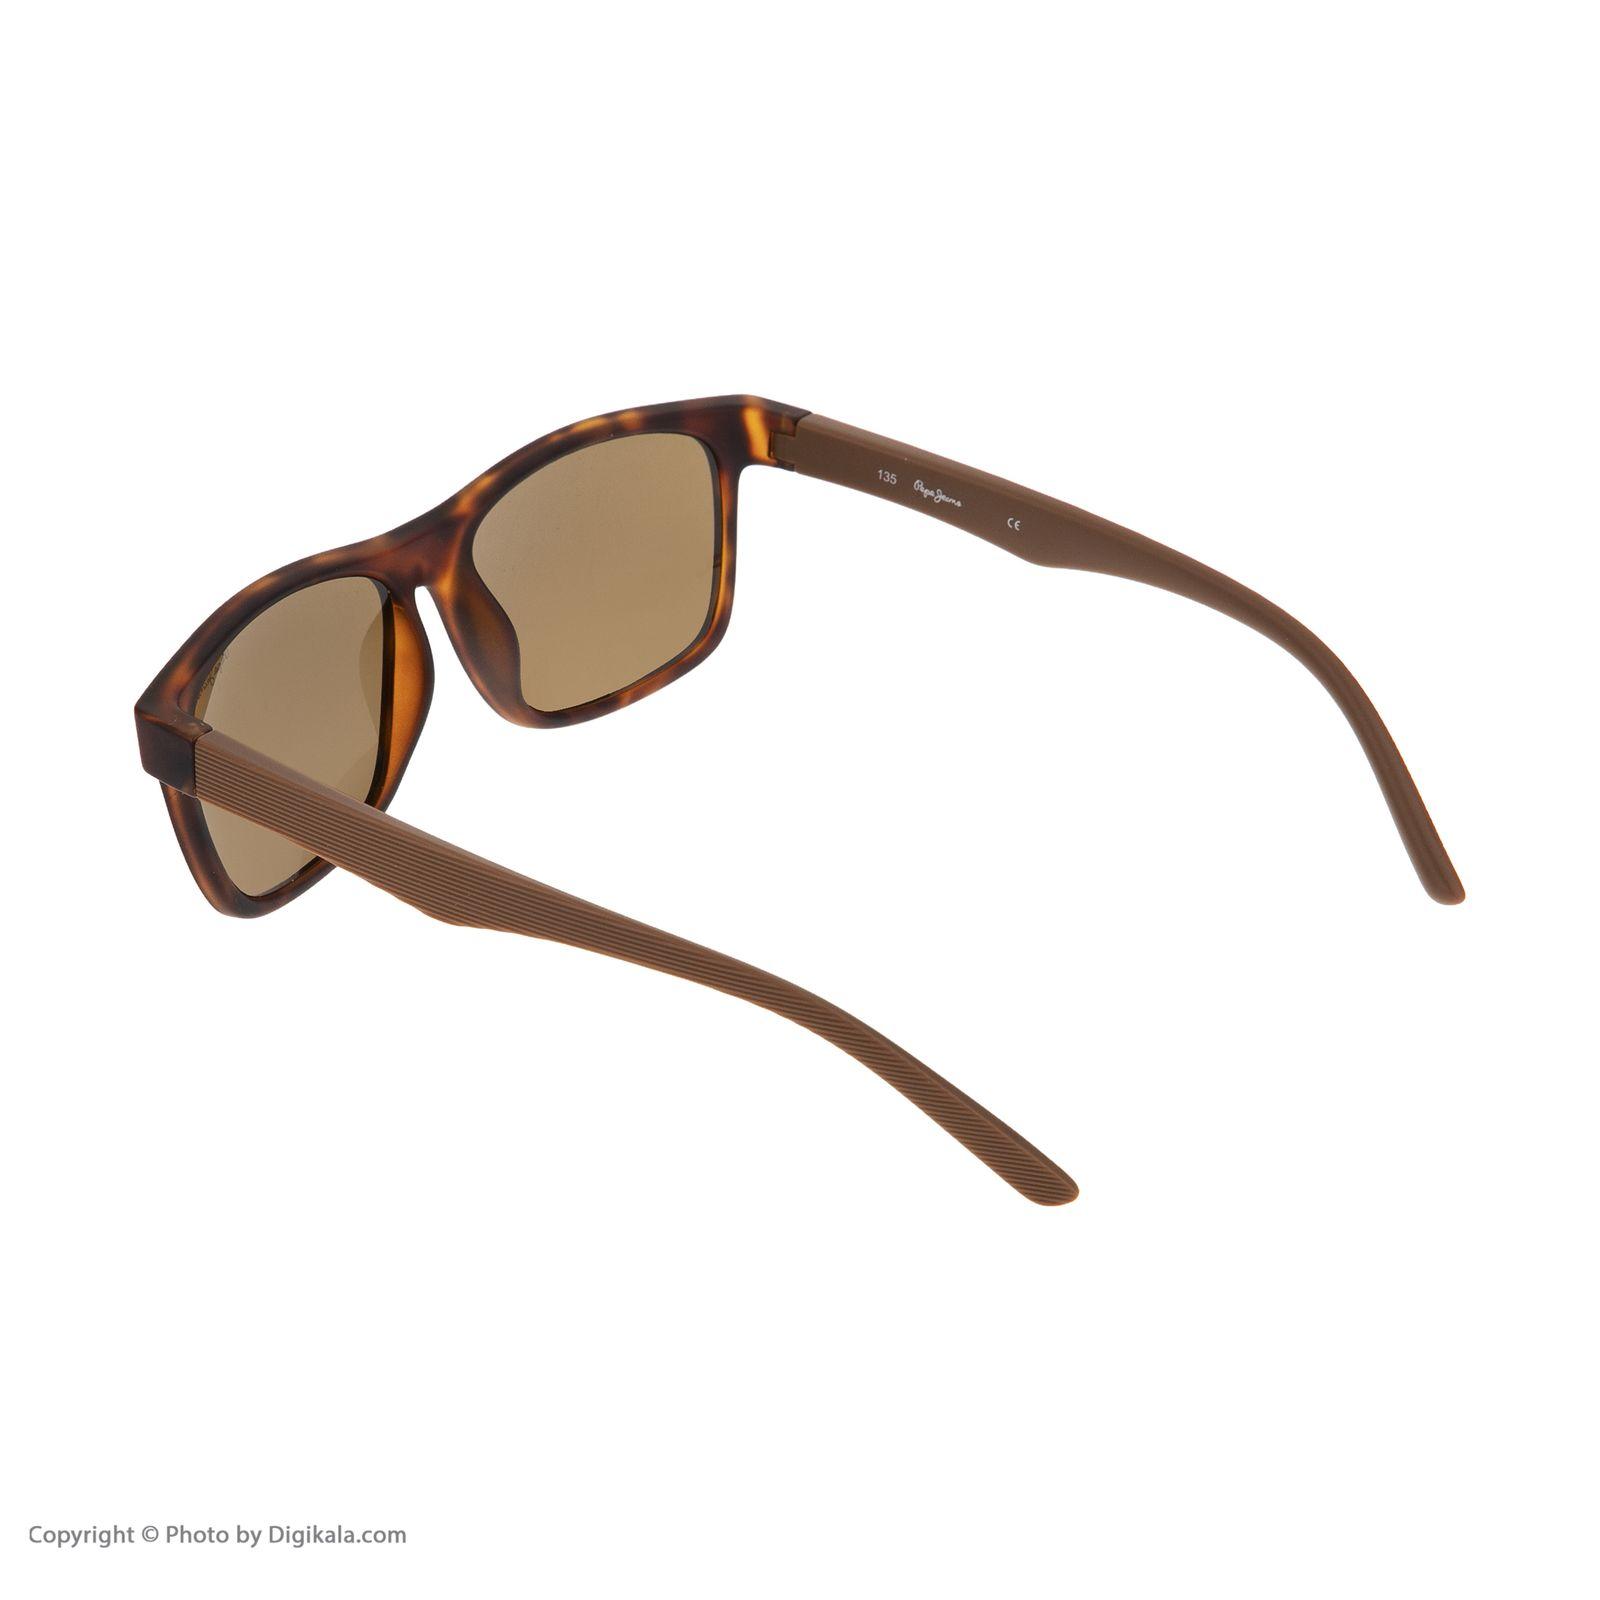 عینک آفتابی زنانه پپه جینز مدل PJ 8039 C2 -  - 4